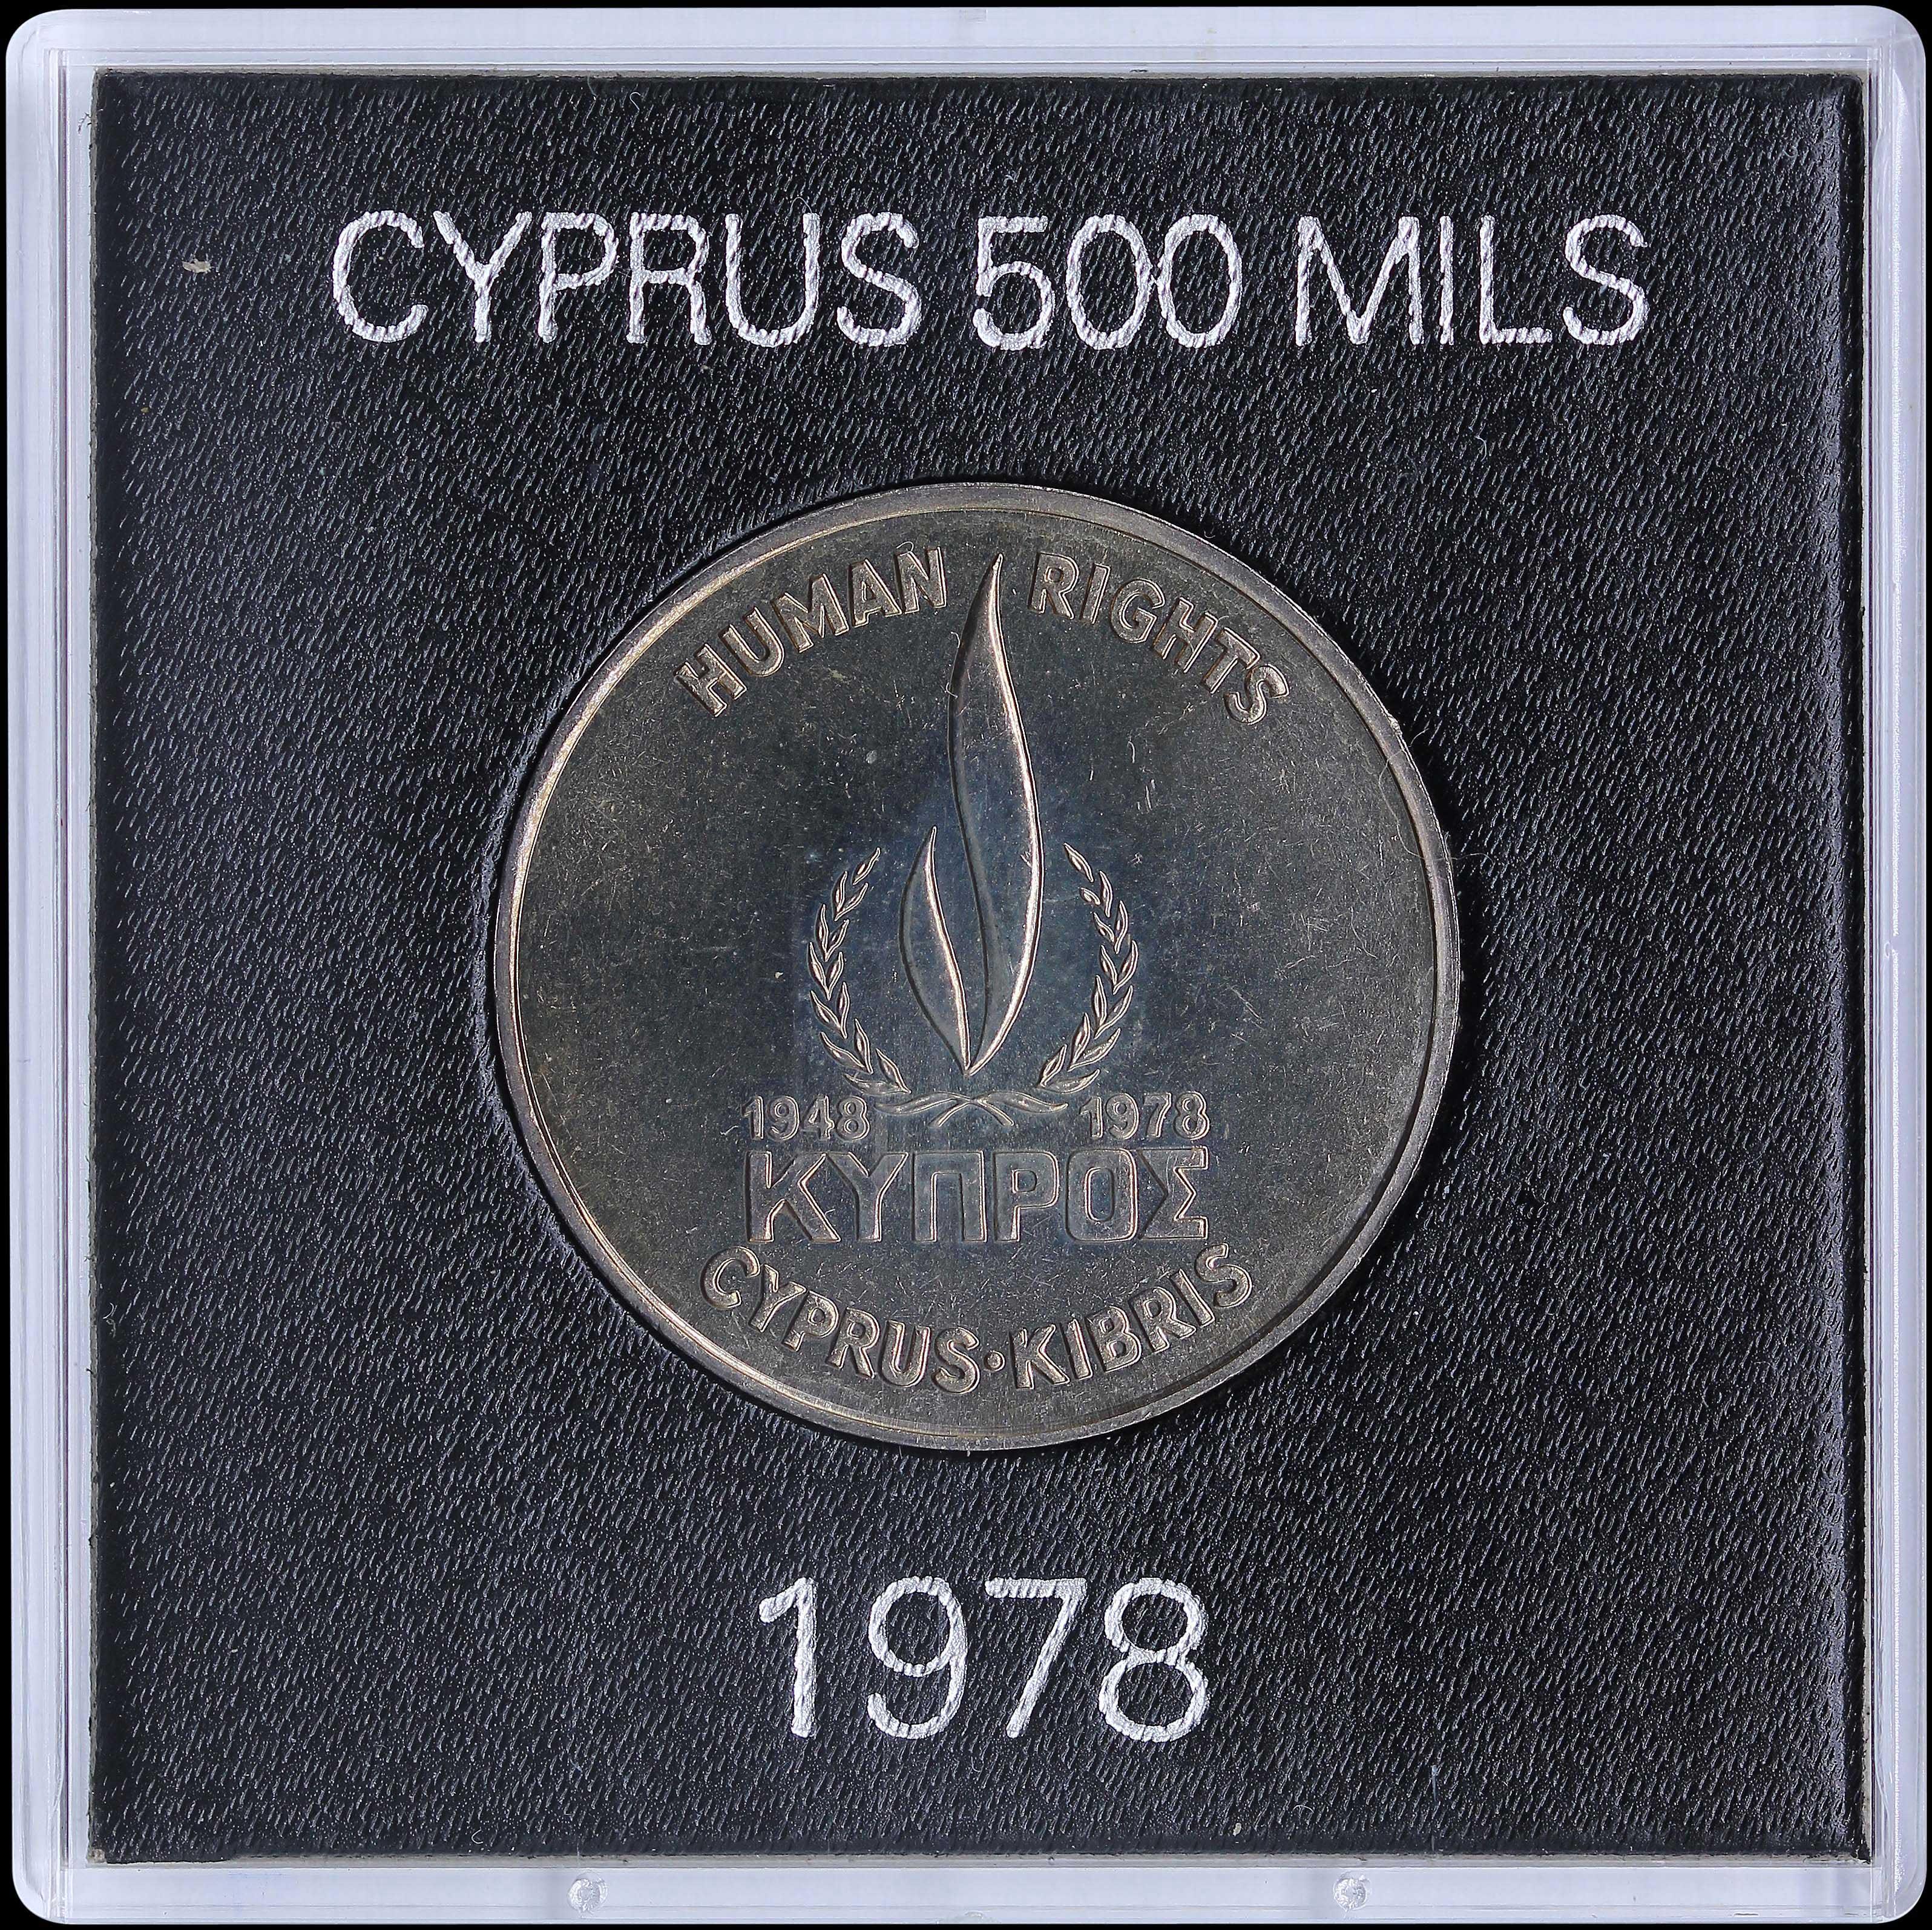 Lot 6305 - -  COINS & TOKENS Cyprus -  A. Karamitsos Public & Live Internet Auction 682 (Part A) Coins, Medals & Banknotes